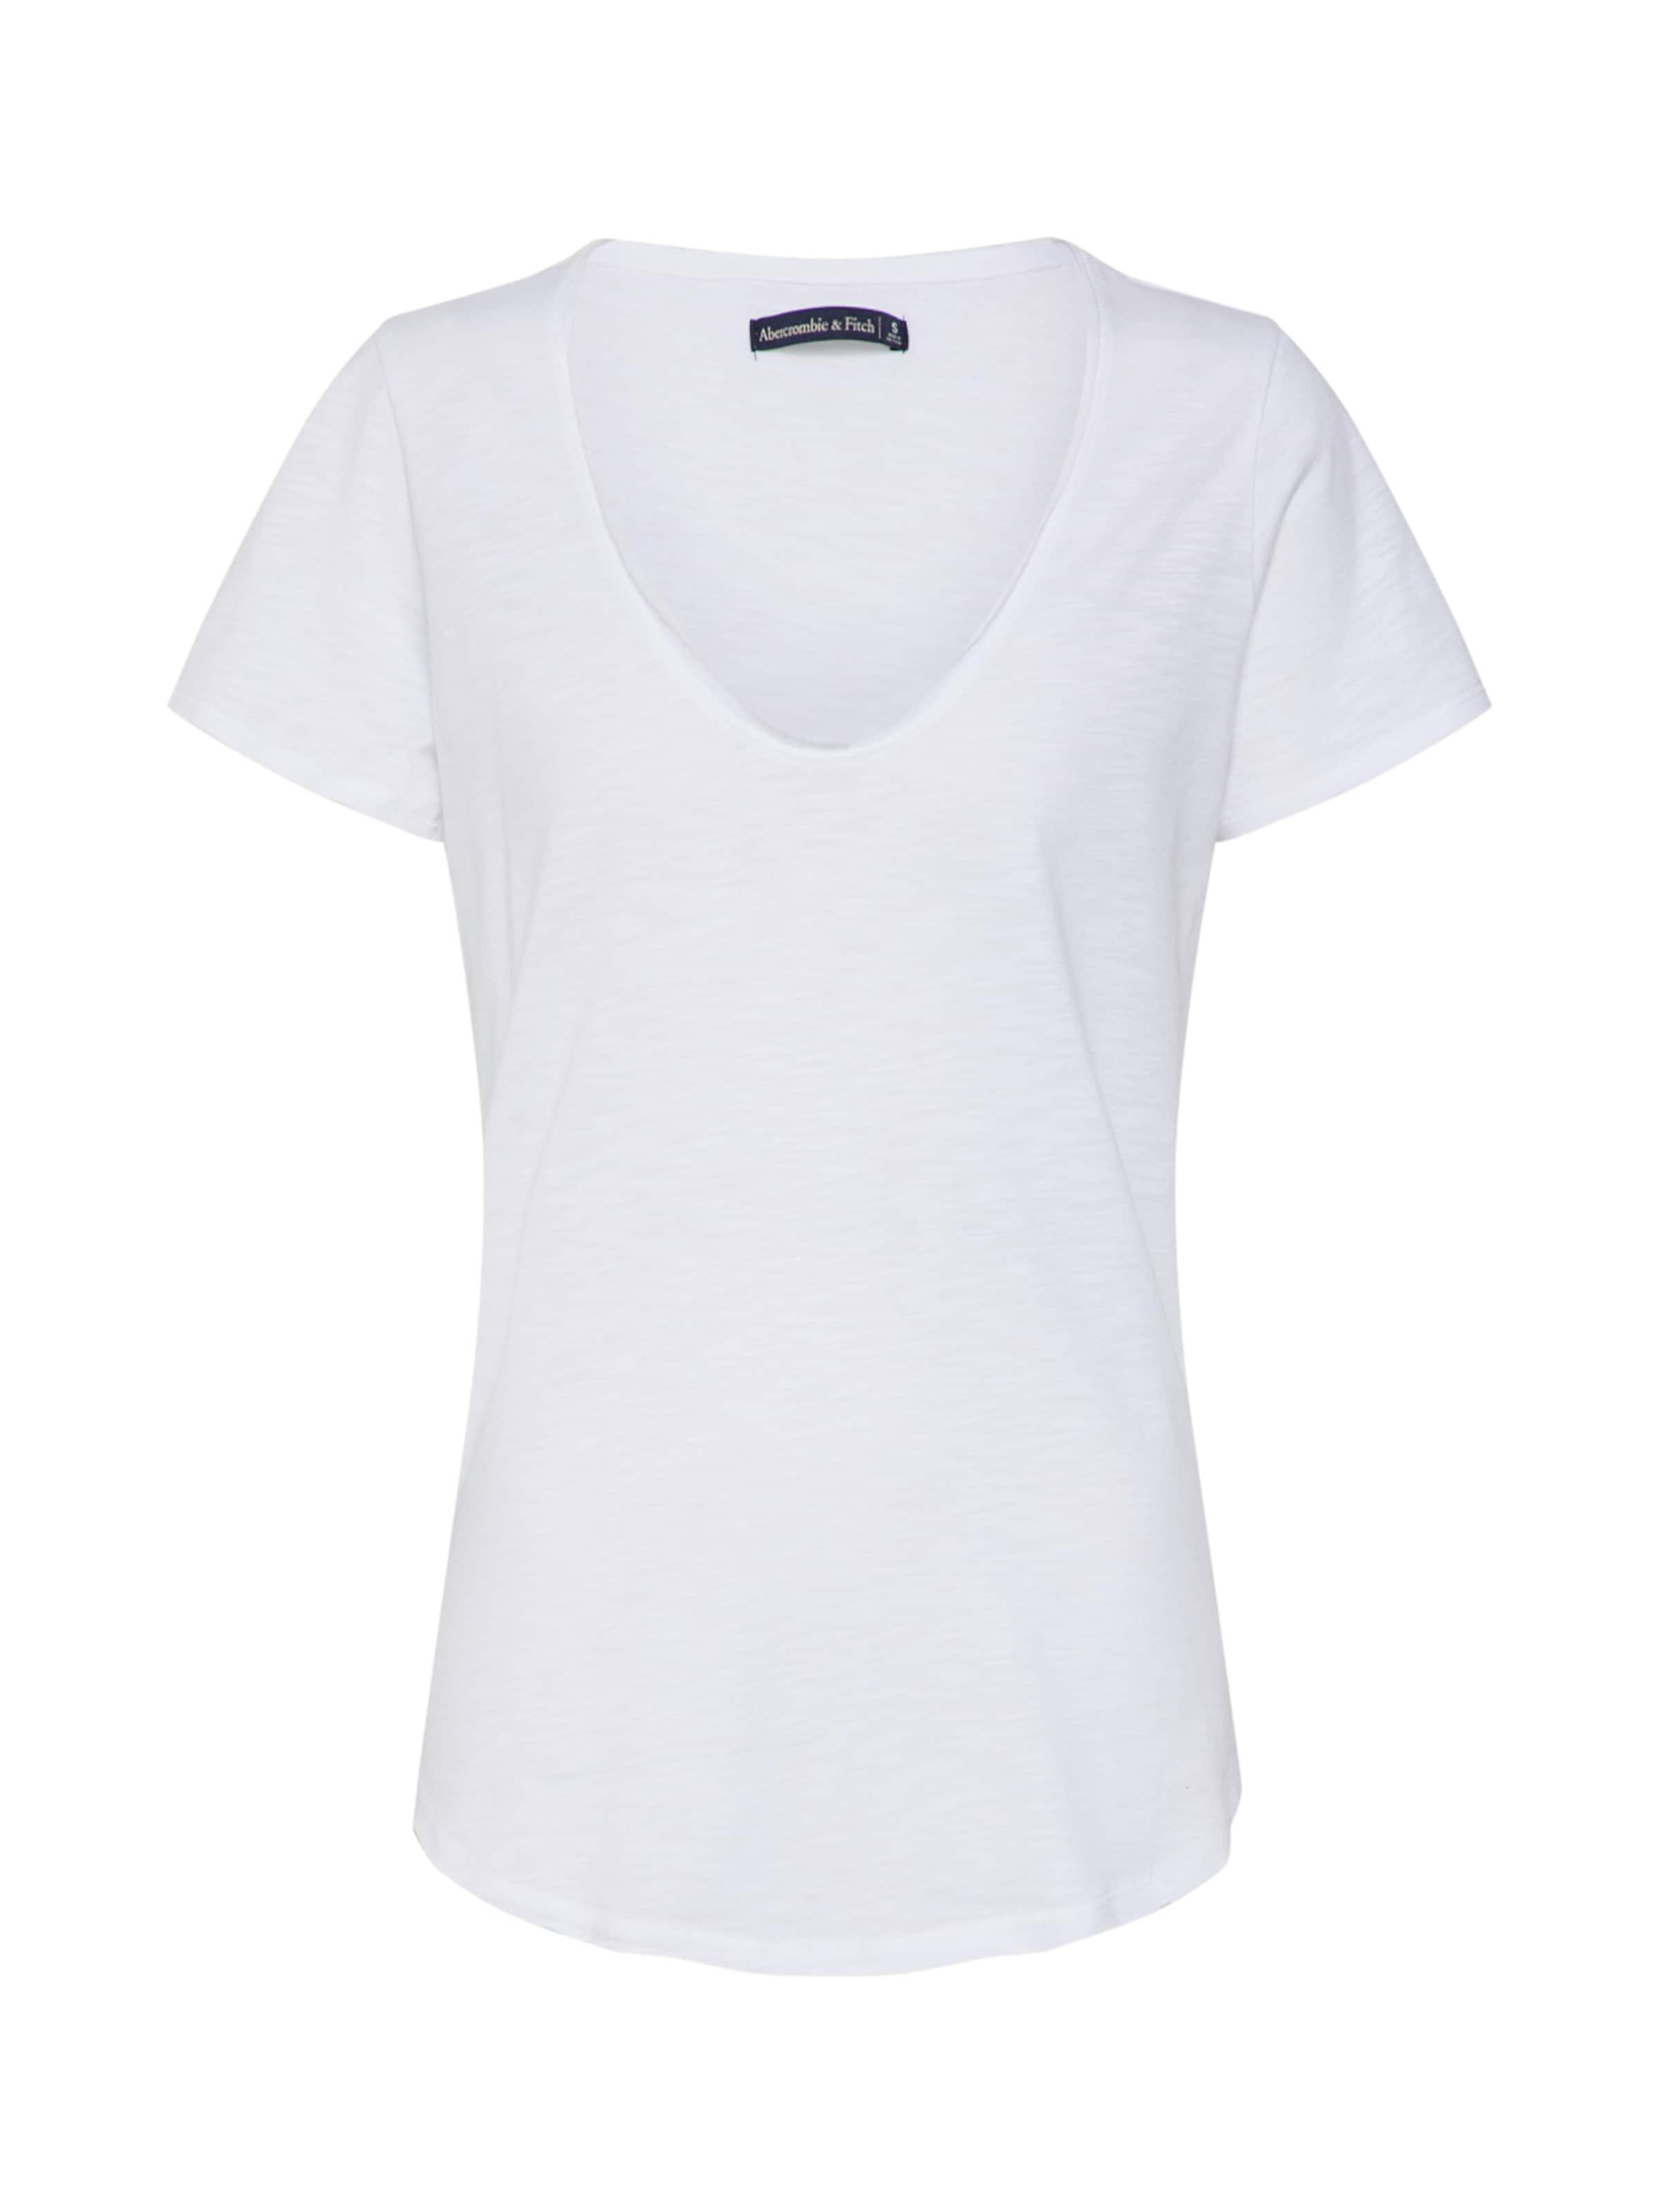 En Abercrombieamp; T Fitch shirt Noir UzSVMp